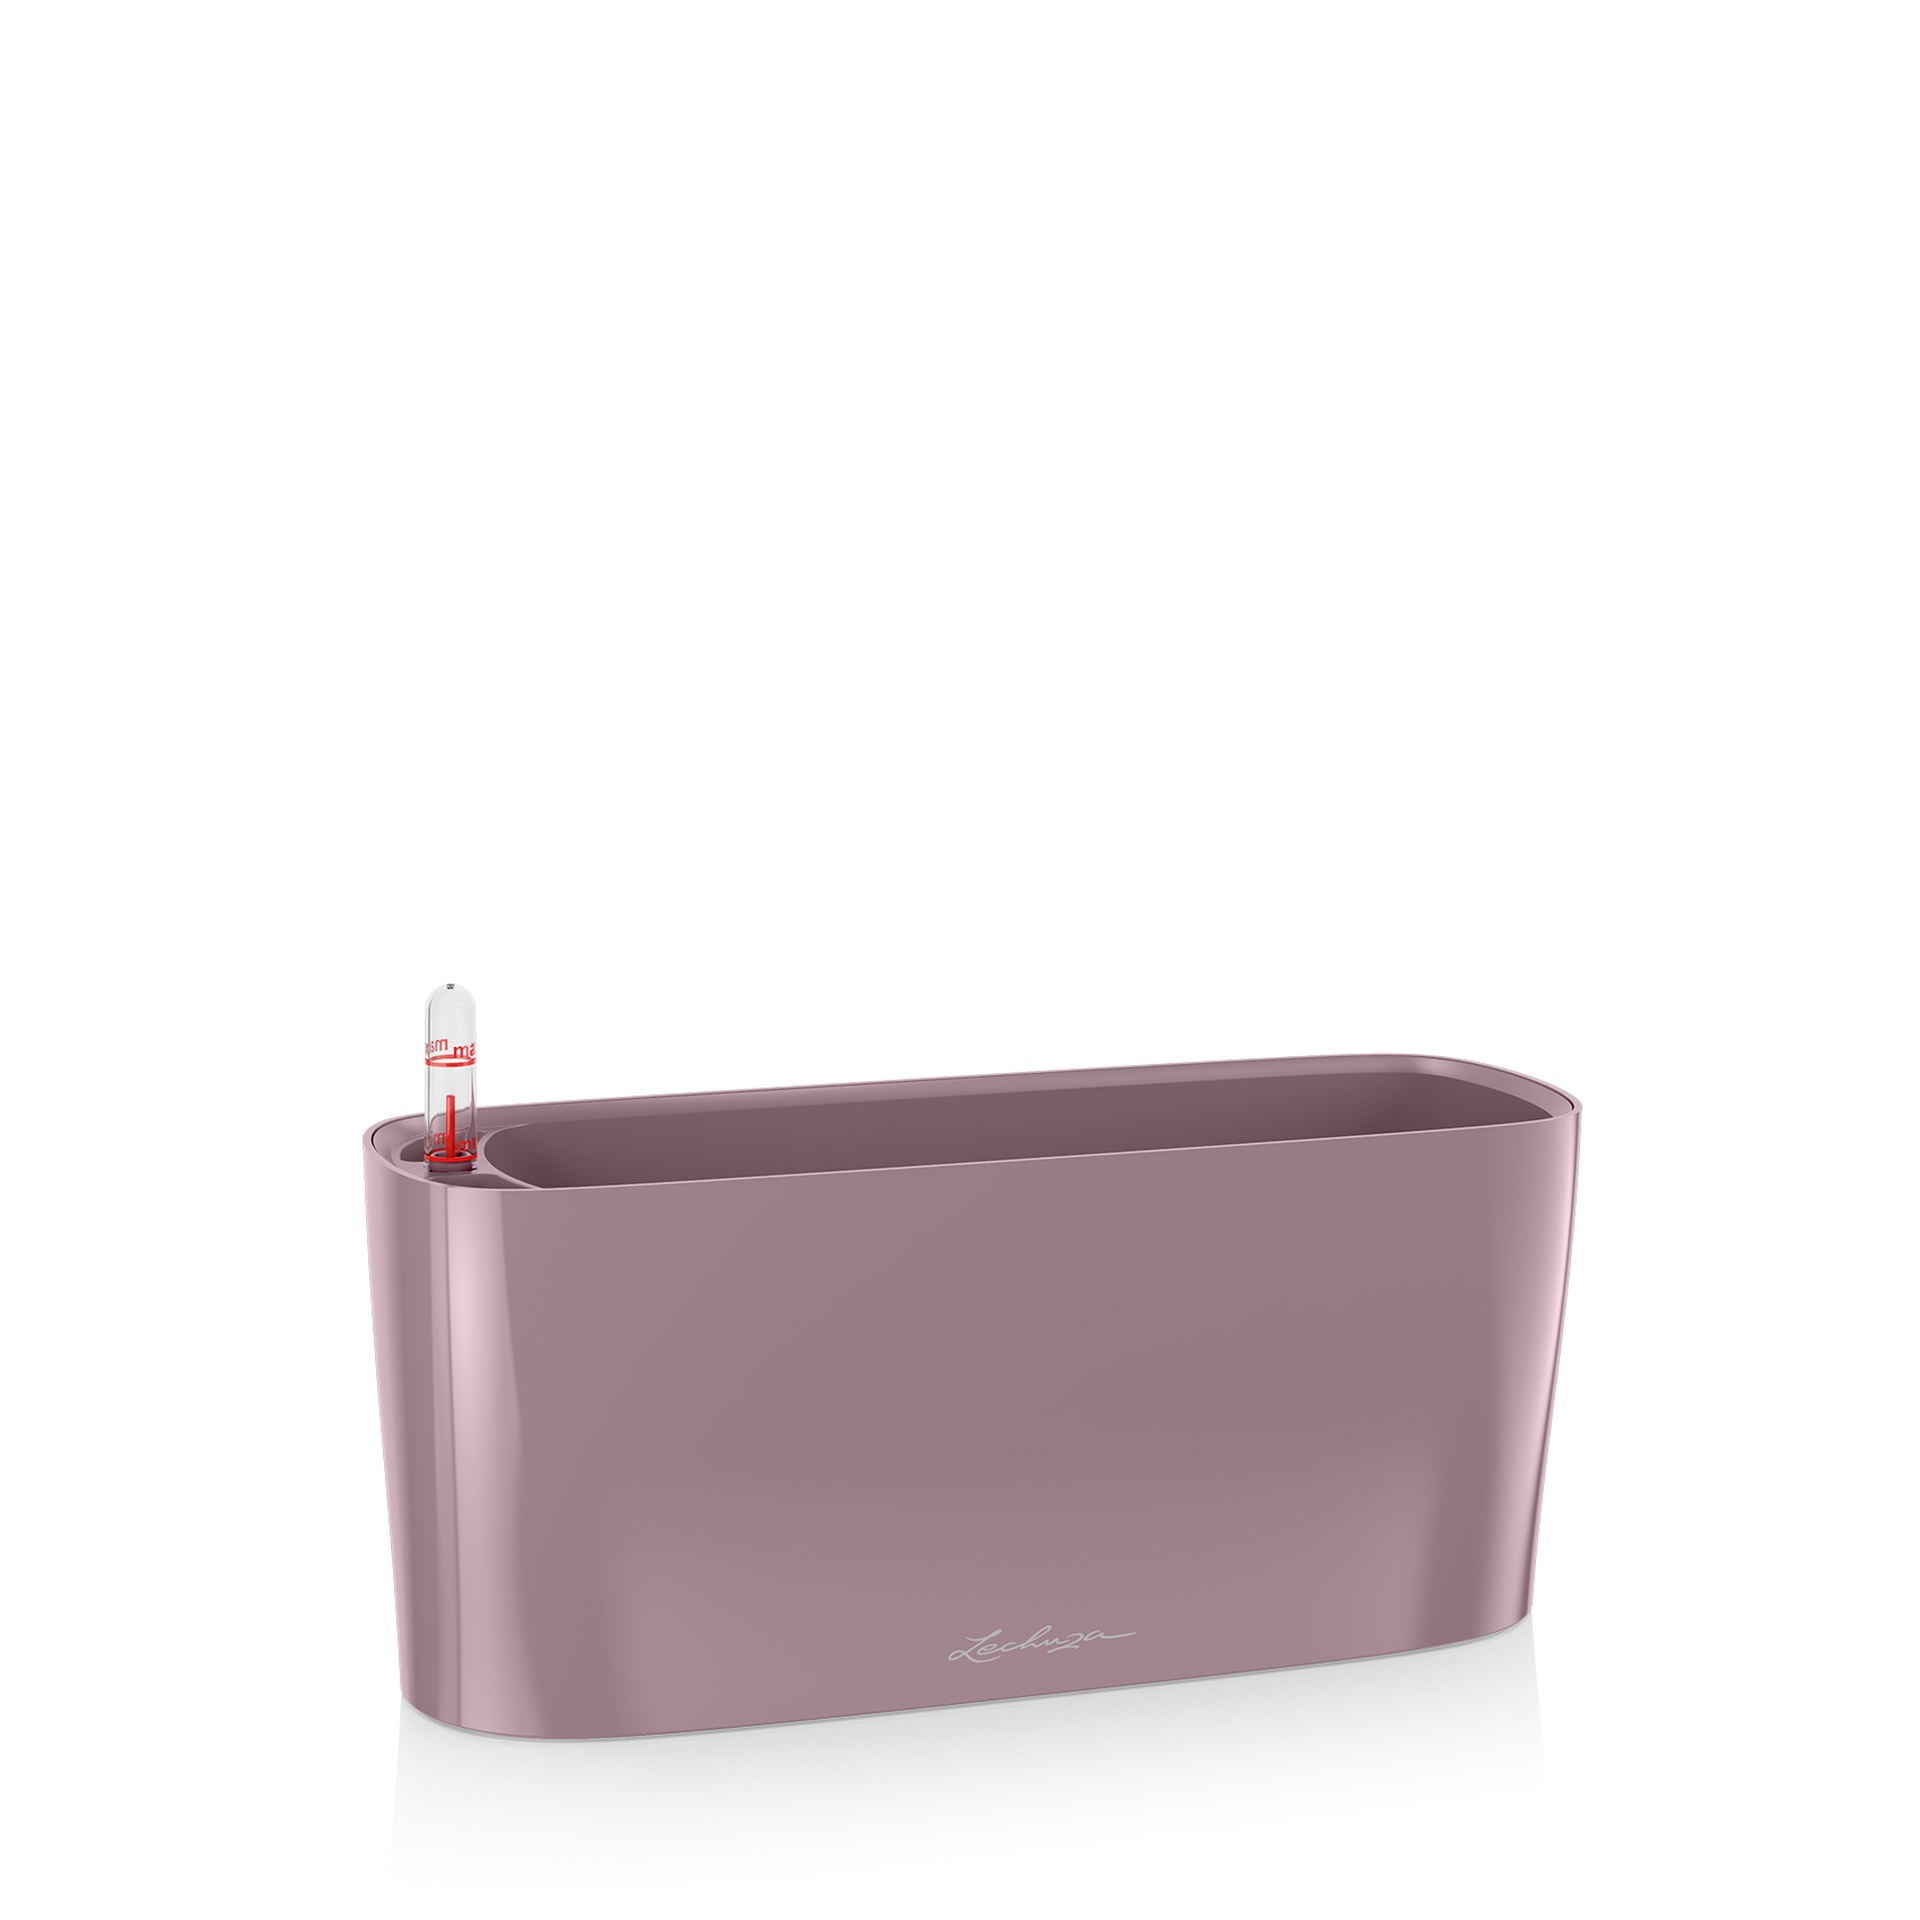 DELTA 10 pastel violet high-gloss